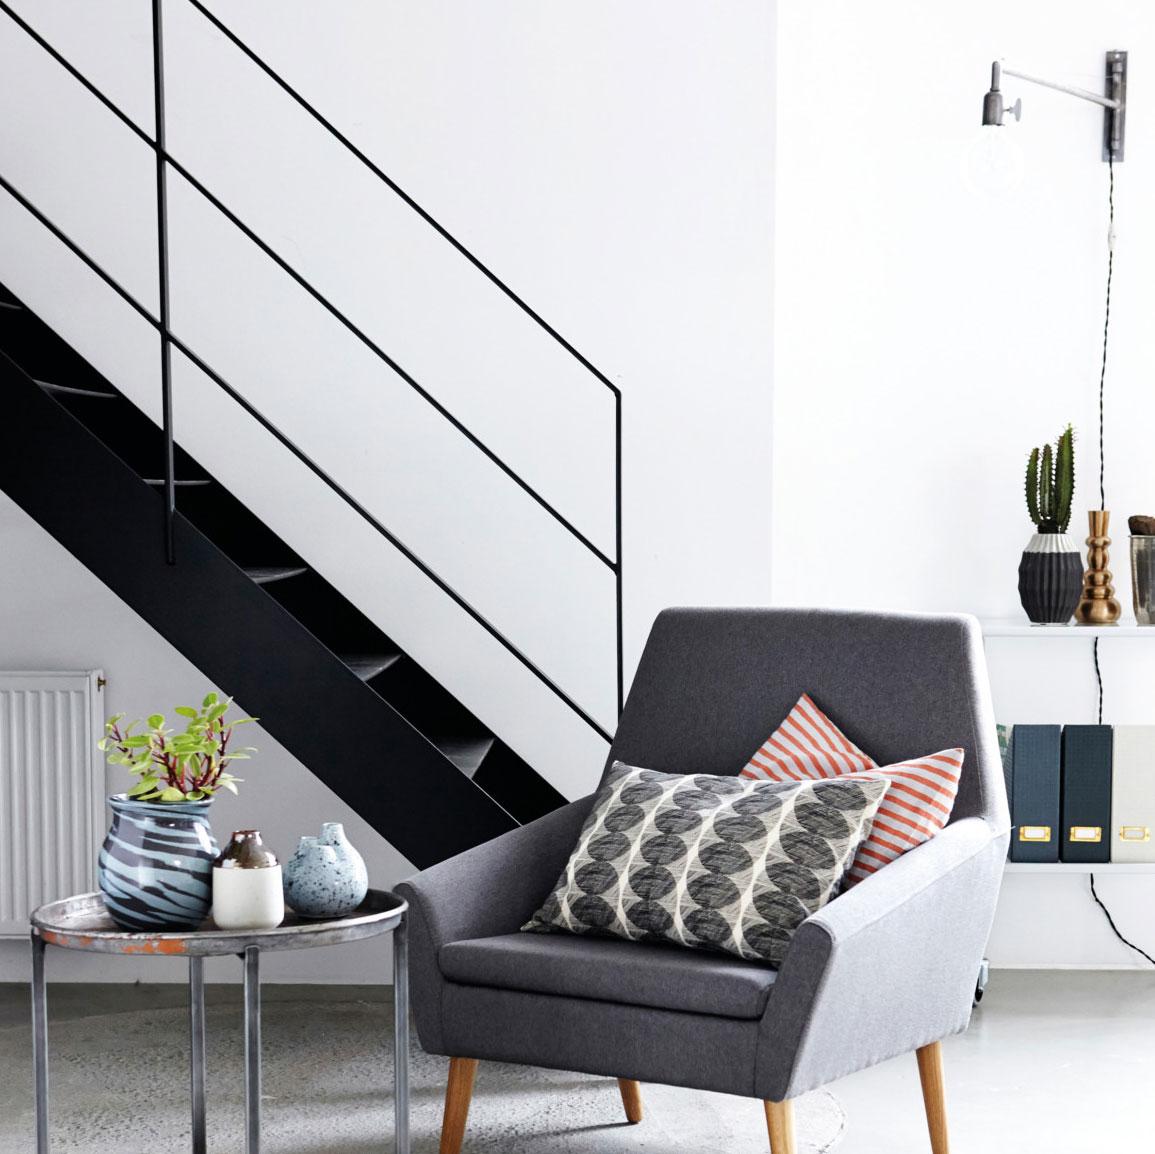 applique potence industrielle. Black Bedroom Furniture Sets. Home Design Ideas